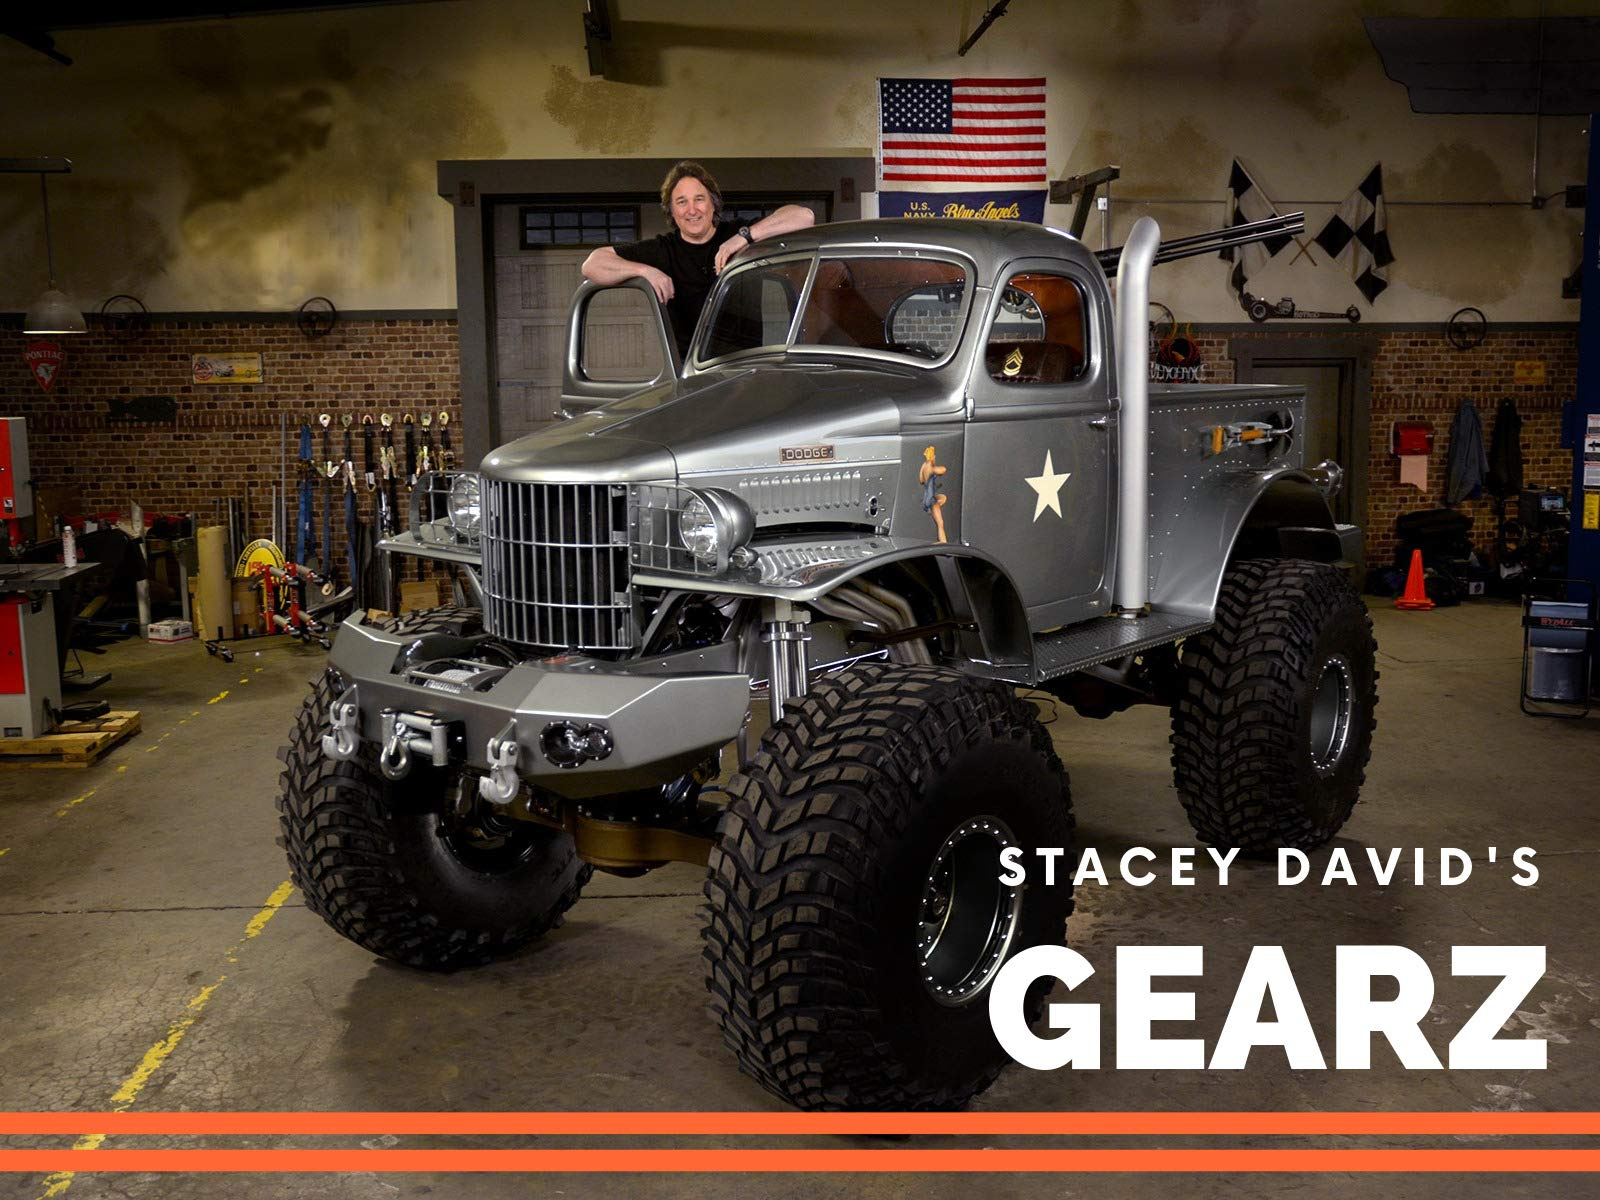 Stacey David's GearZ